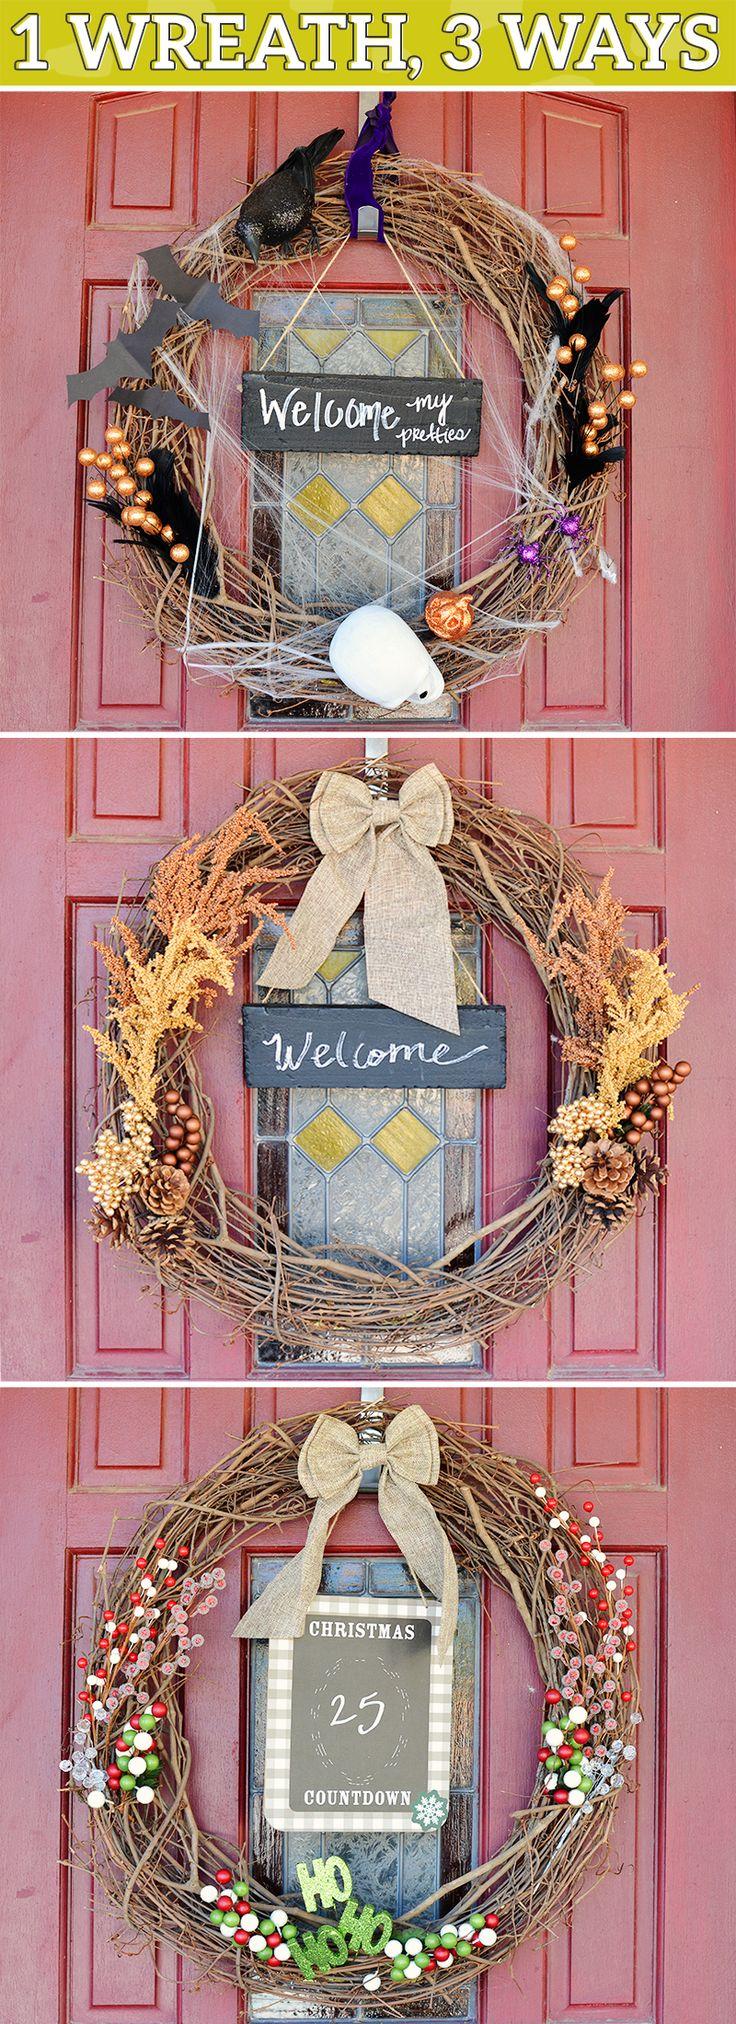 Holiday Decor: 1 Wreath, 3 Ways for under $20 #diy #halloween #thanksgiving #christmas